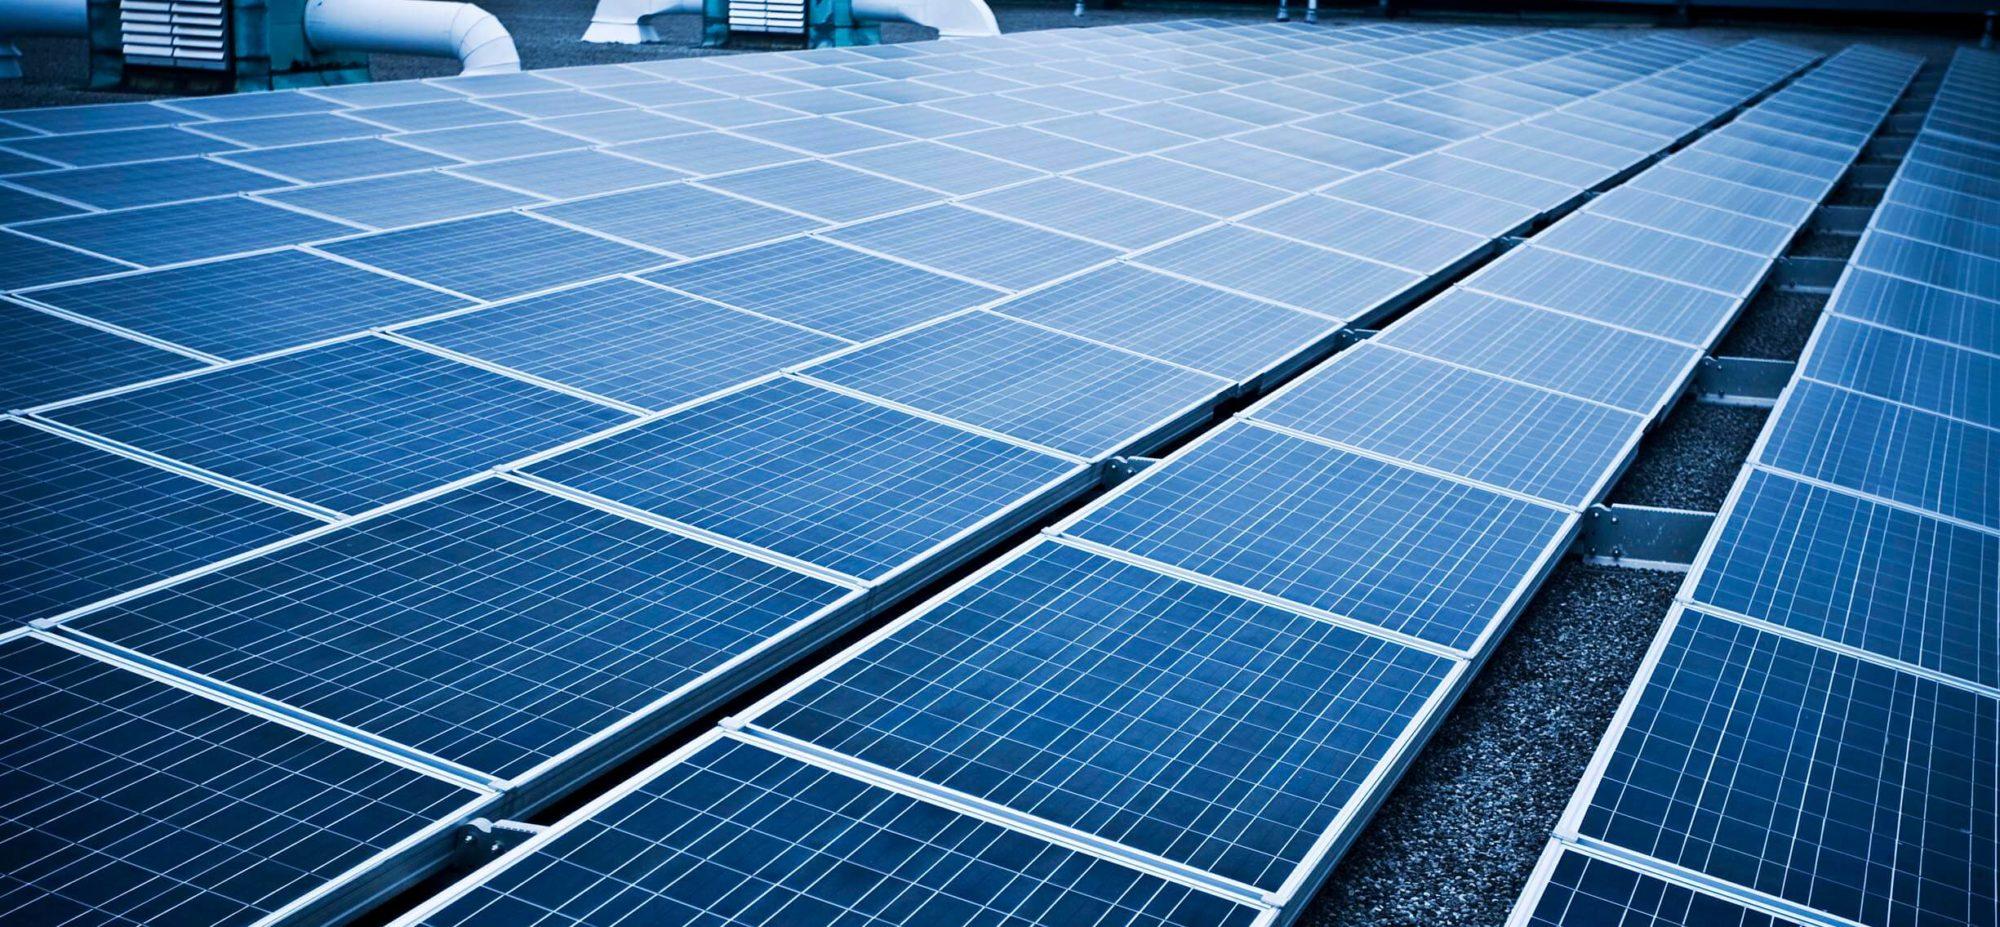 SVAI_energia rinnovabile_impianto fotovoltaico aziendale